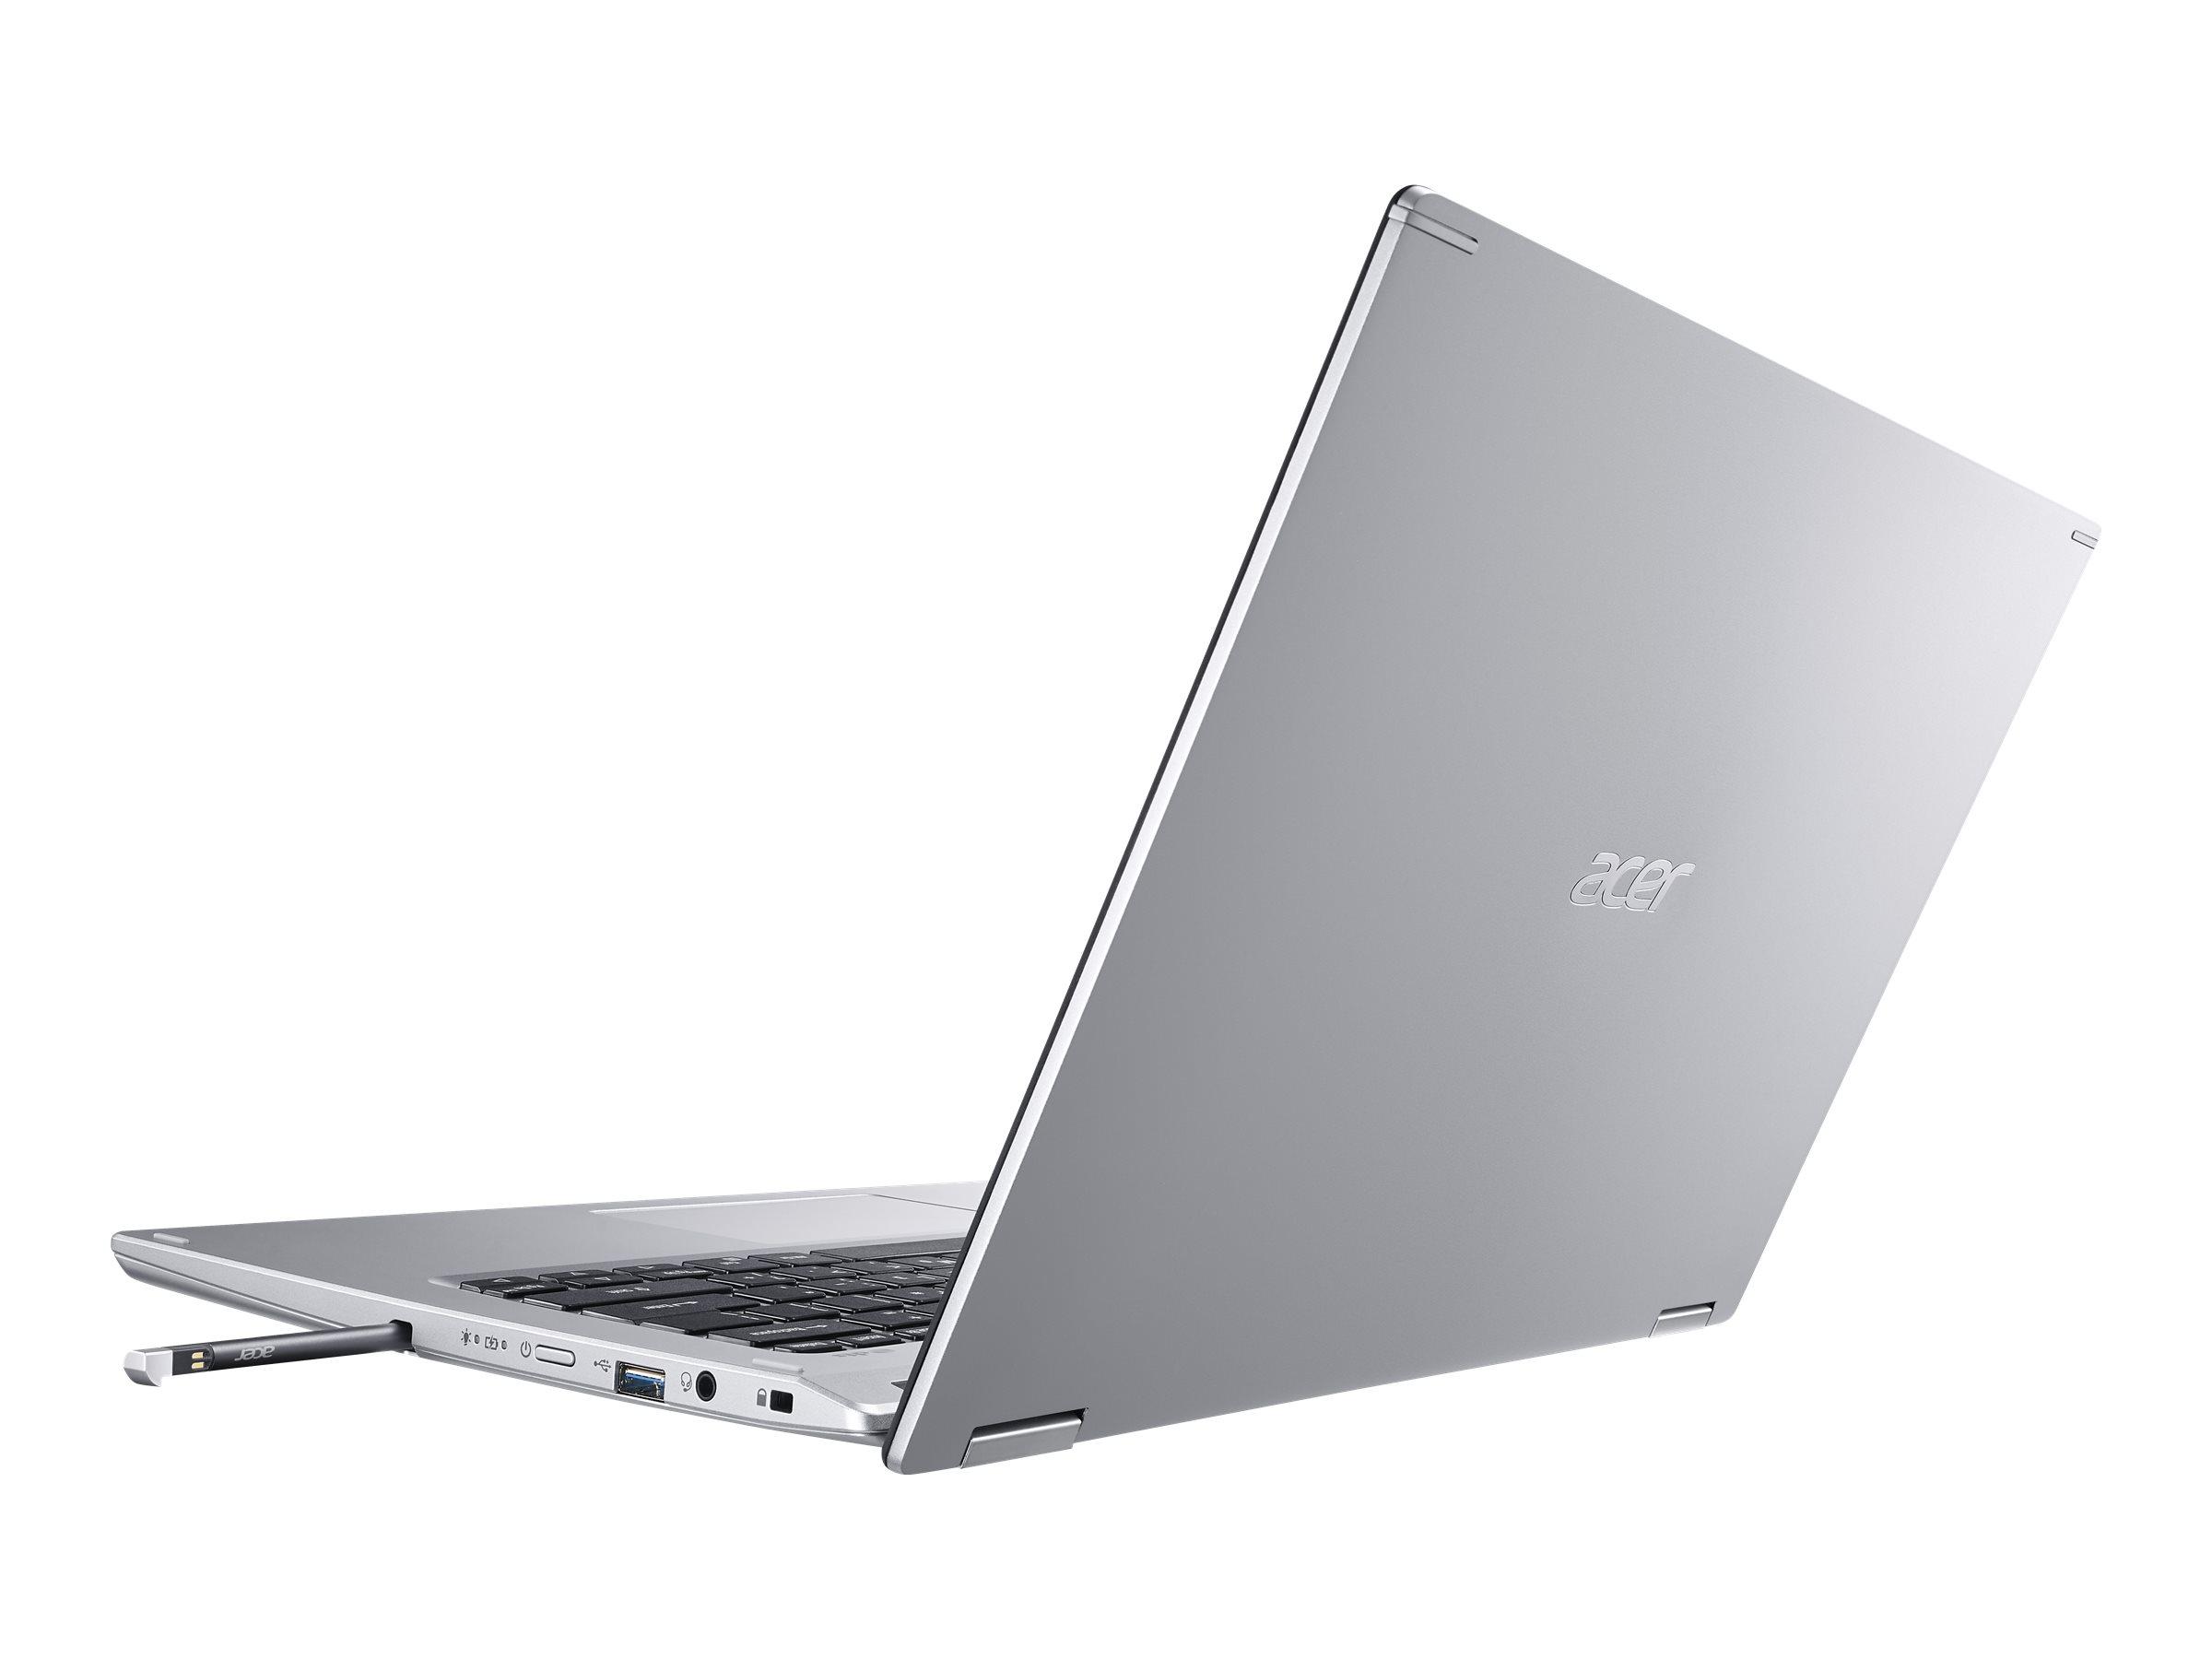 "Acer Spin 3 SP314-54N-57C3 - Flip-Design - Core i5 1035G4 / 1.1 GHz - Win 10 Pro 64-Bit - 8 GB RAM - 256 GB SSD - 35.56 cm (14"")"